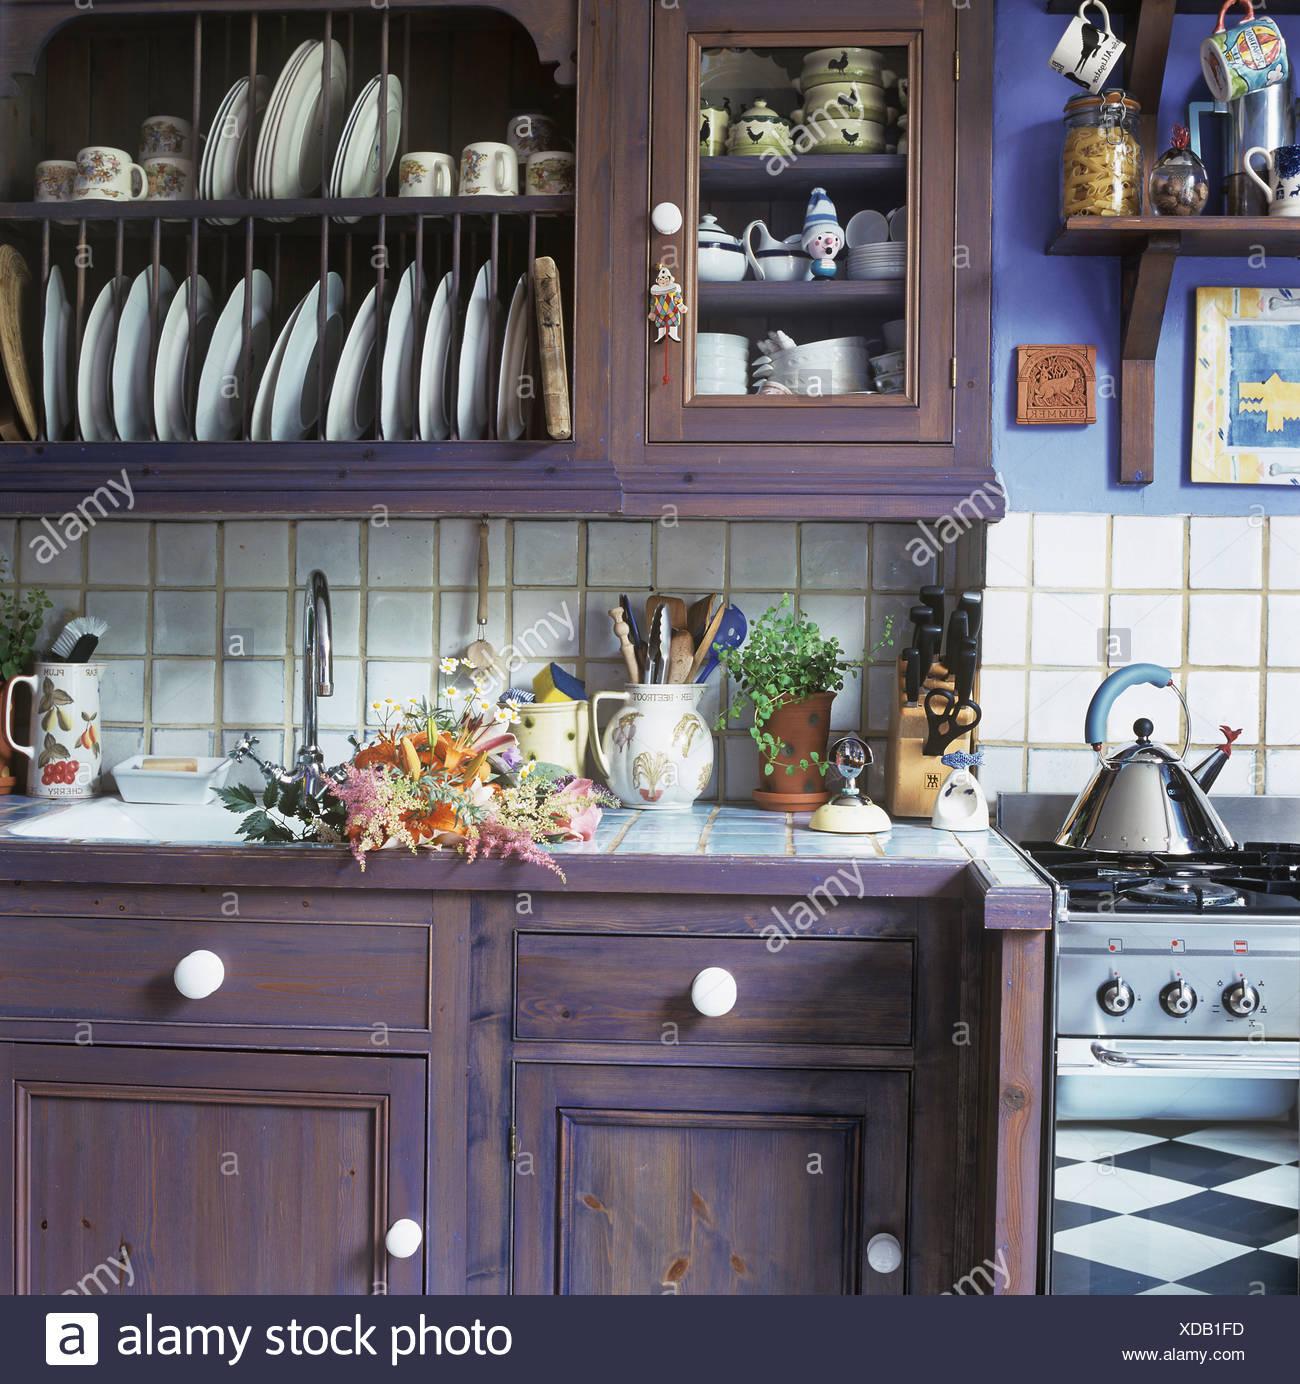 Armadio A Muro Per Cucina.Viola Dipinte Di Armadio A Muro Con Piastra Integrale Sopra Rack